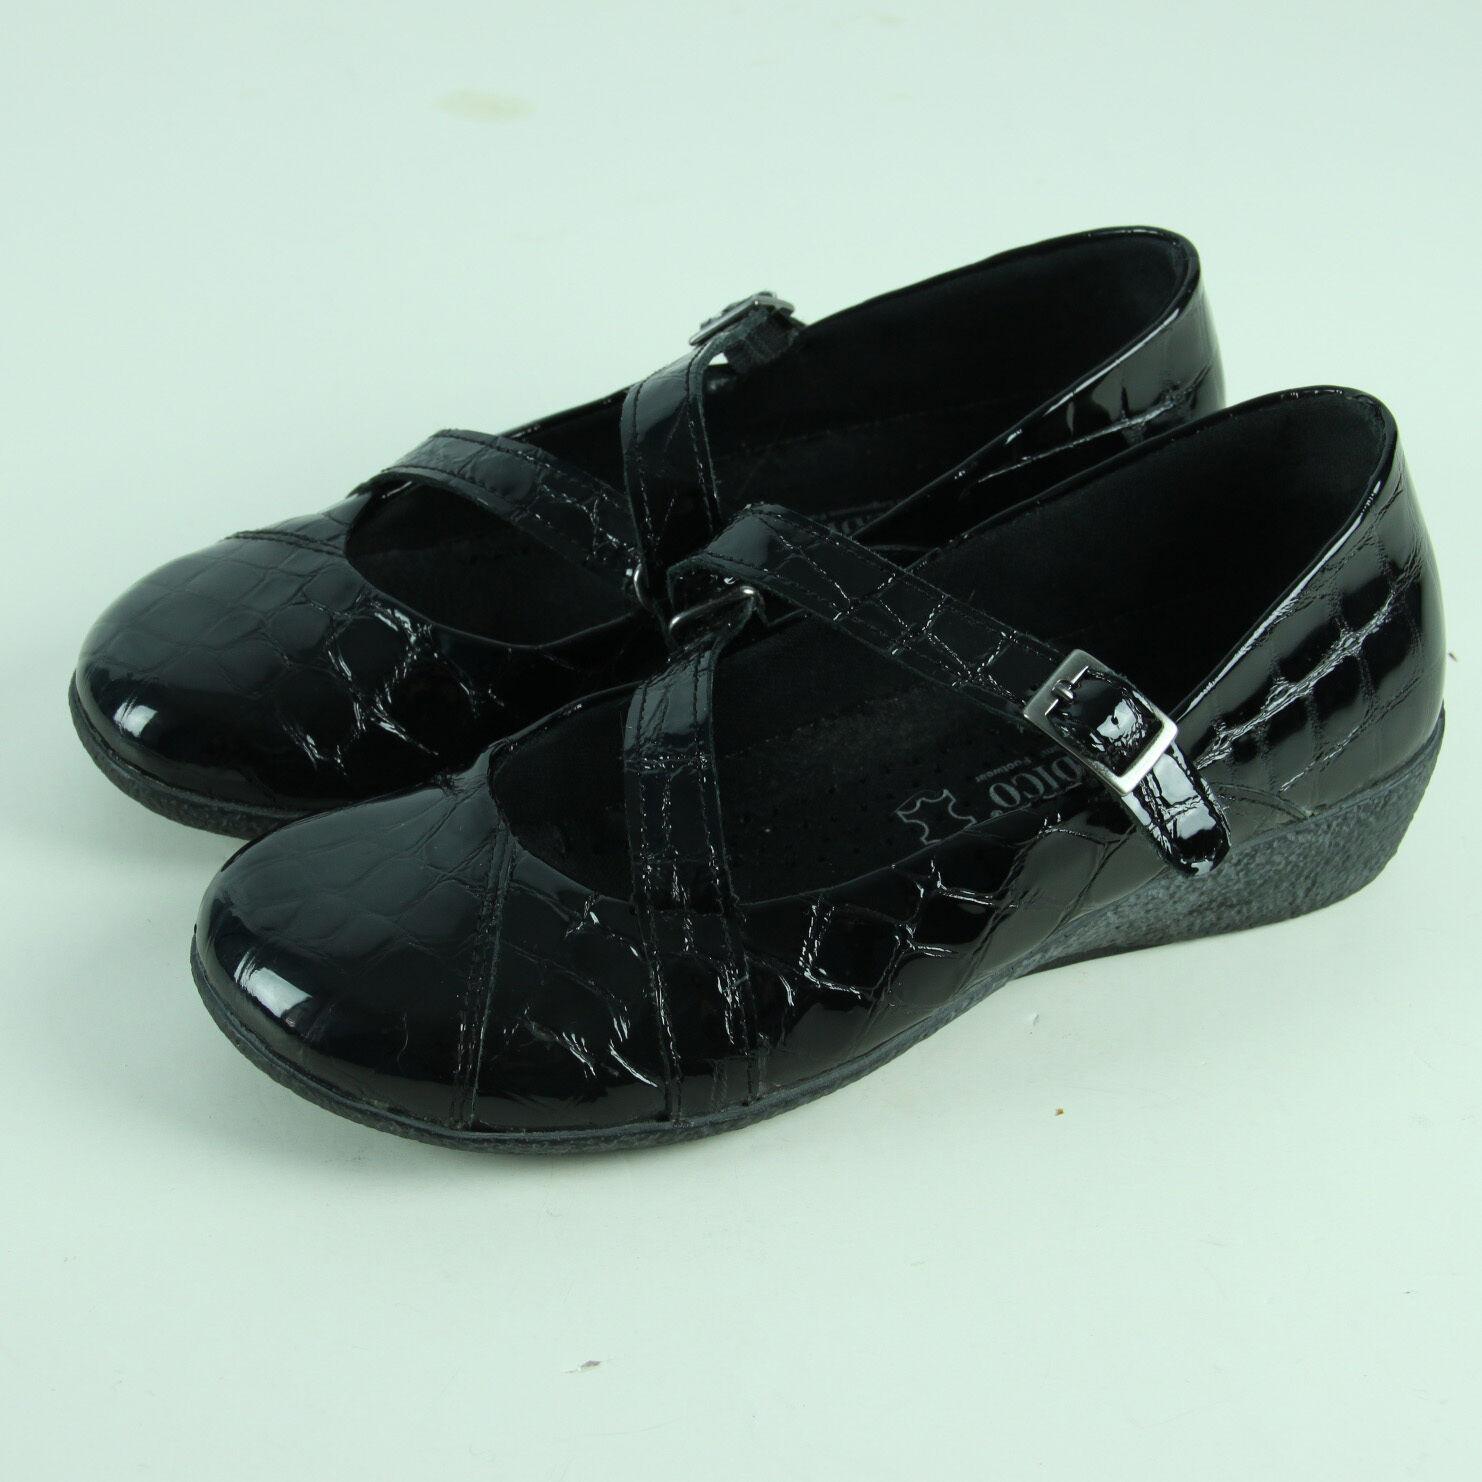 Arcopedico Mary Janes Size 37 6.5 shoes Black Croc Patent A'rcopedico Wedges